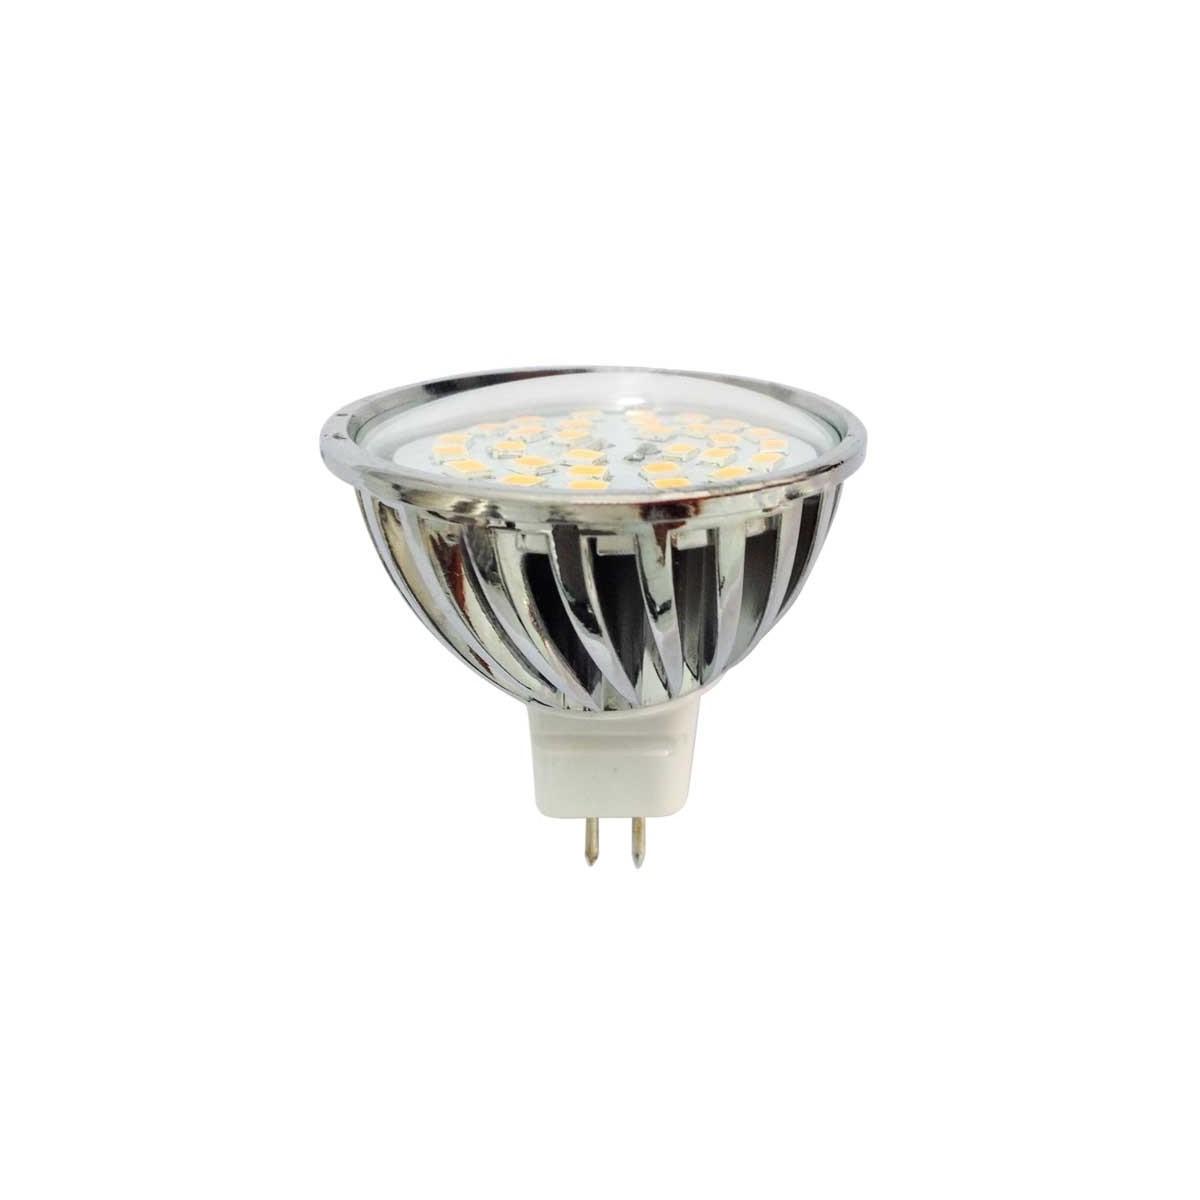 Bombilla LED MR16, 7 W, 4200 K, 520 Lm.